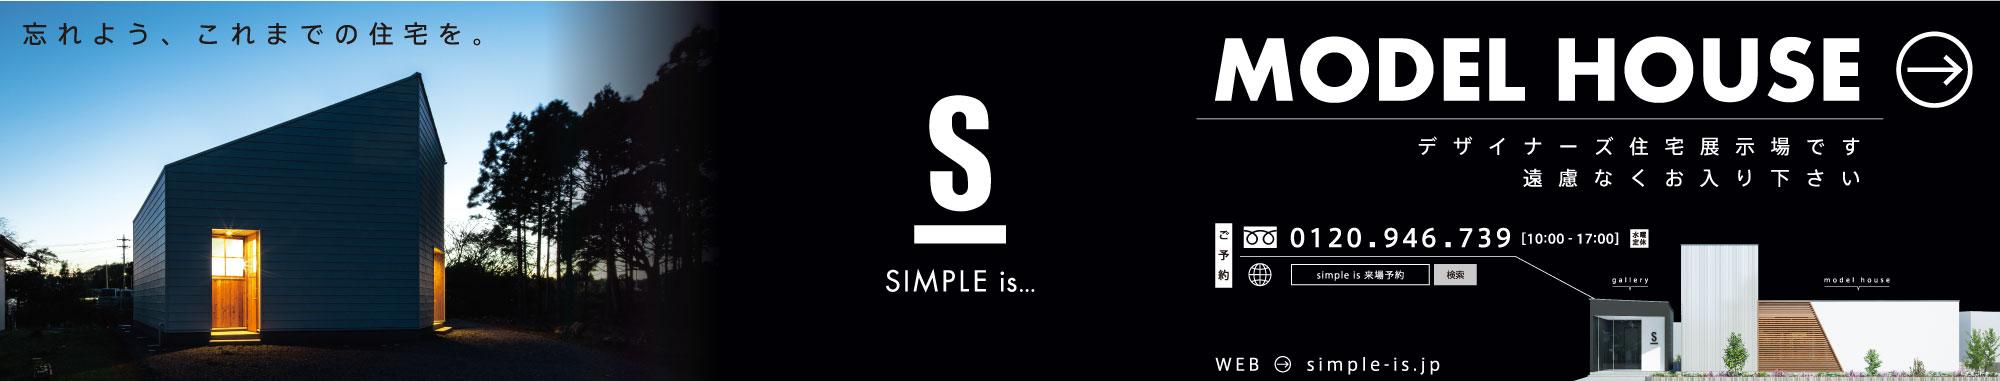 SIMPLE is...様モデルハウス案内看板